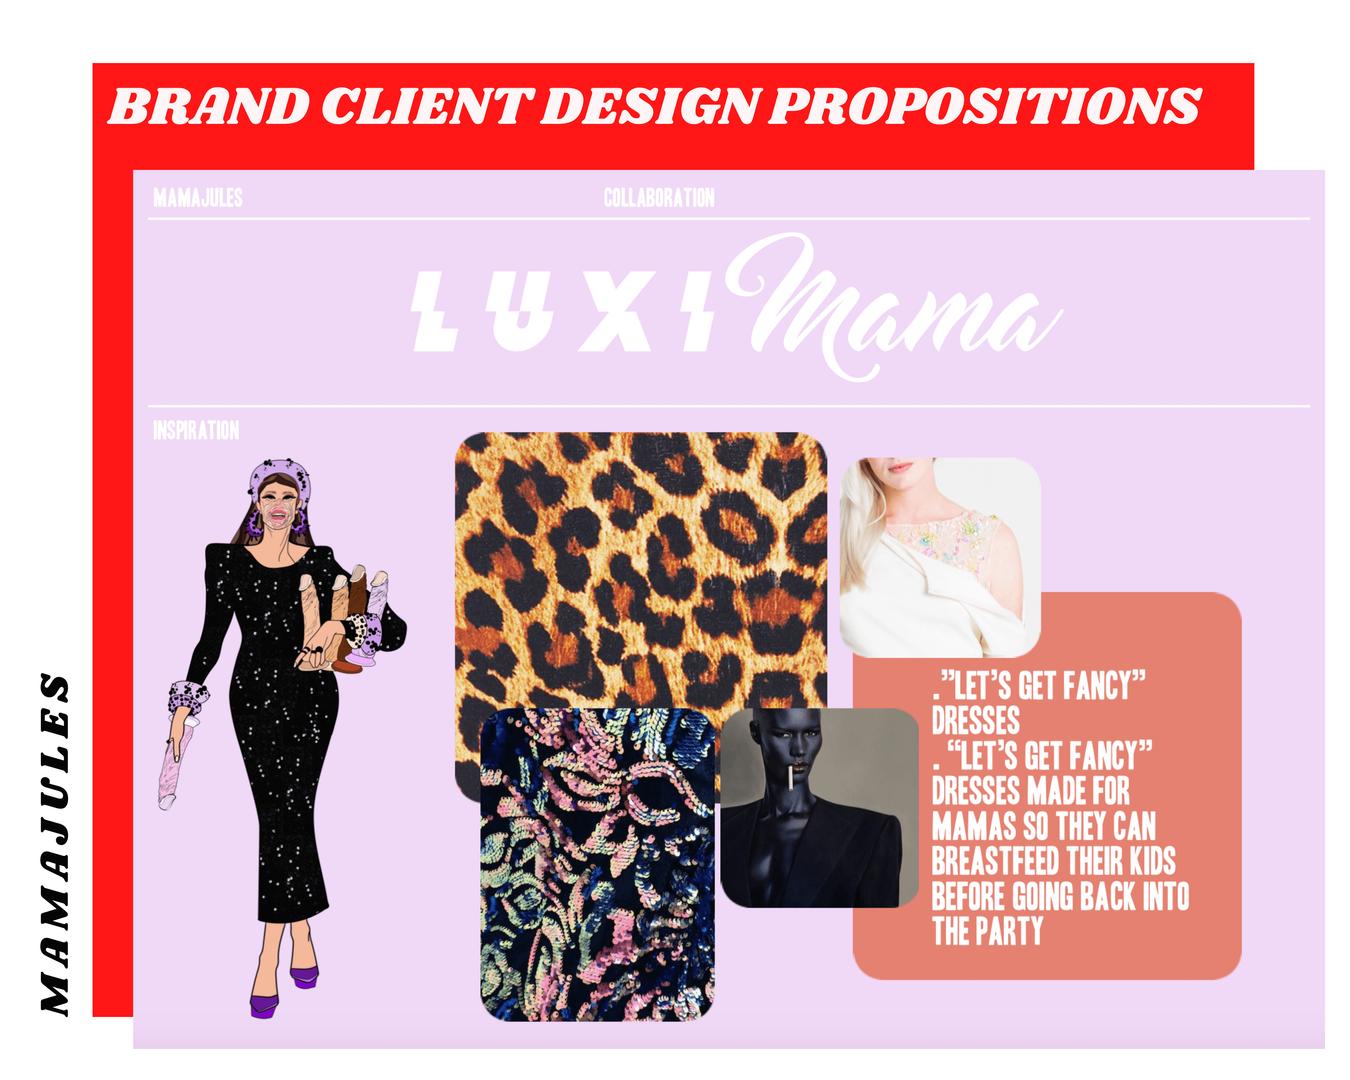 malin-molden-design-oslo-freelance-mocku